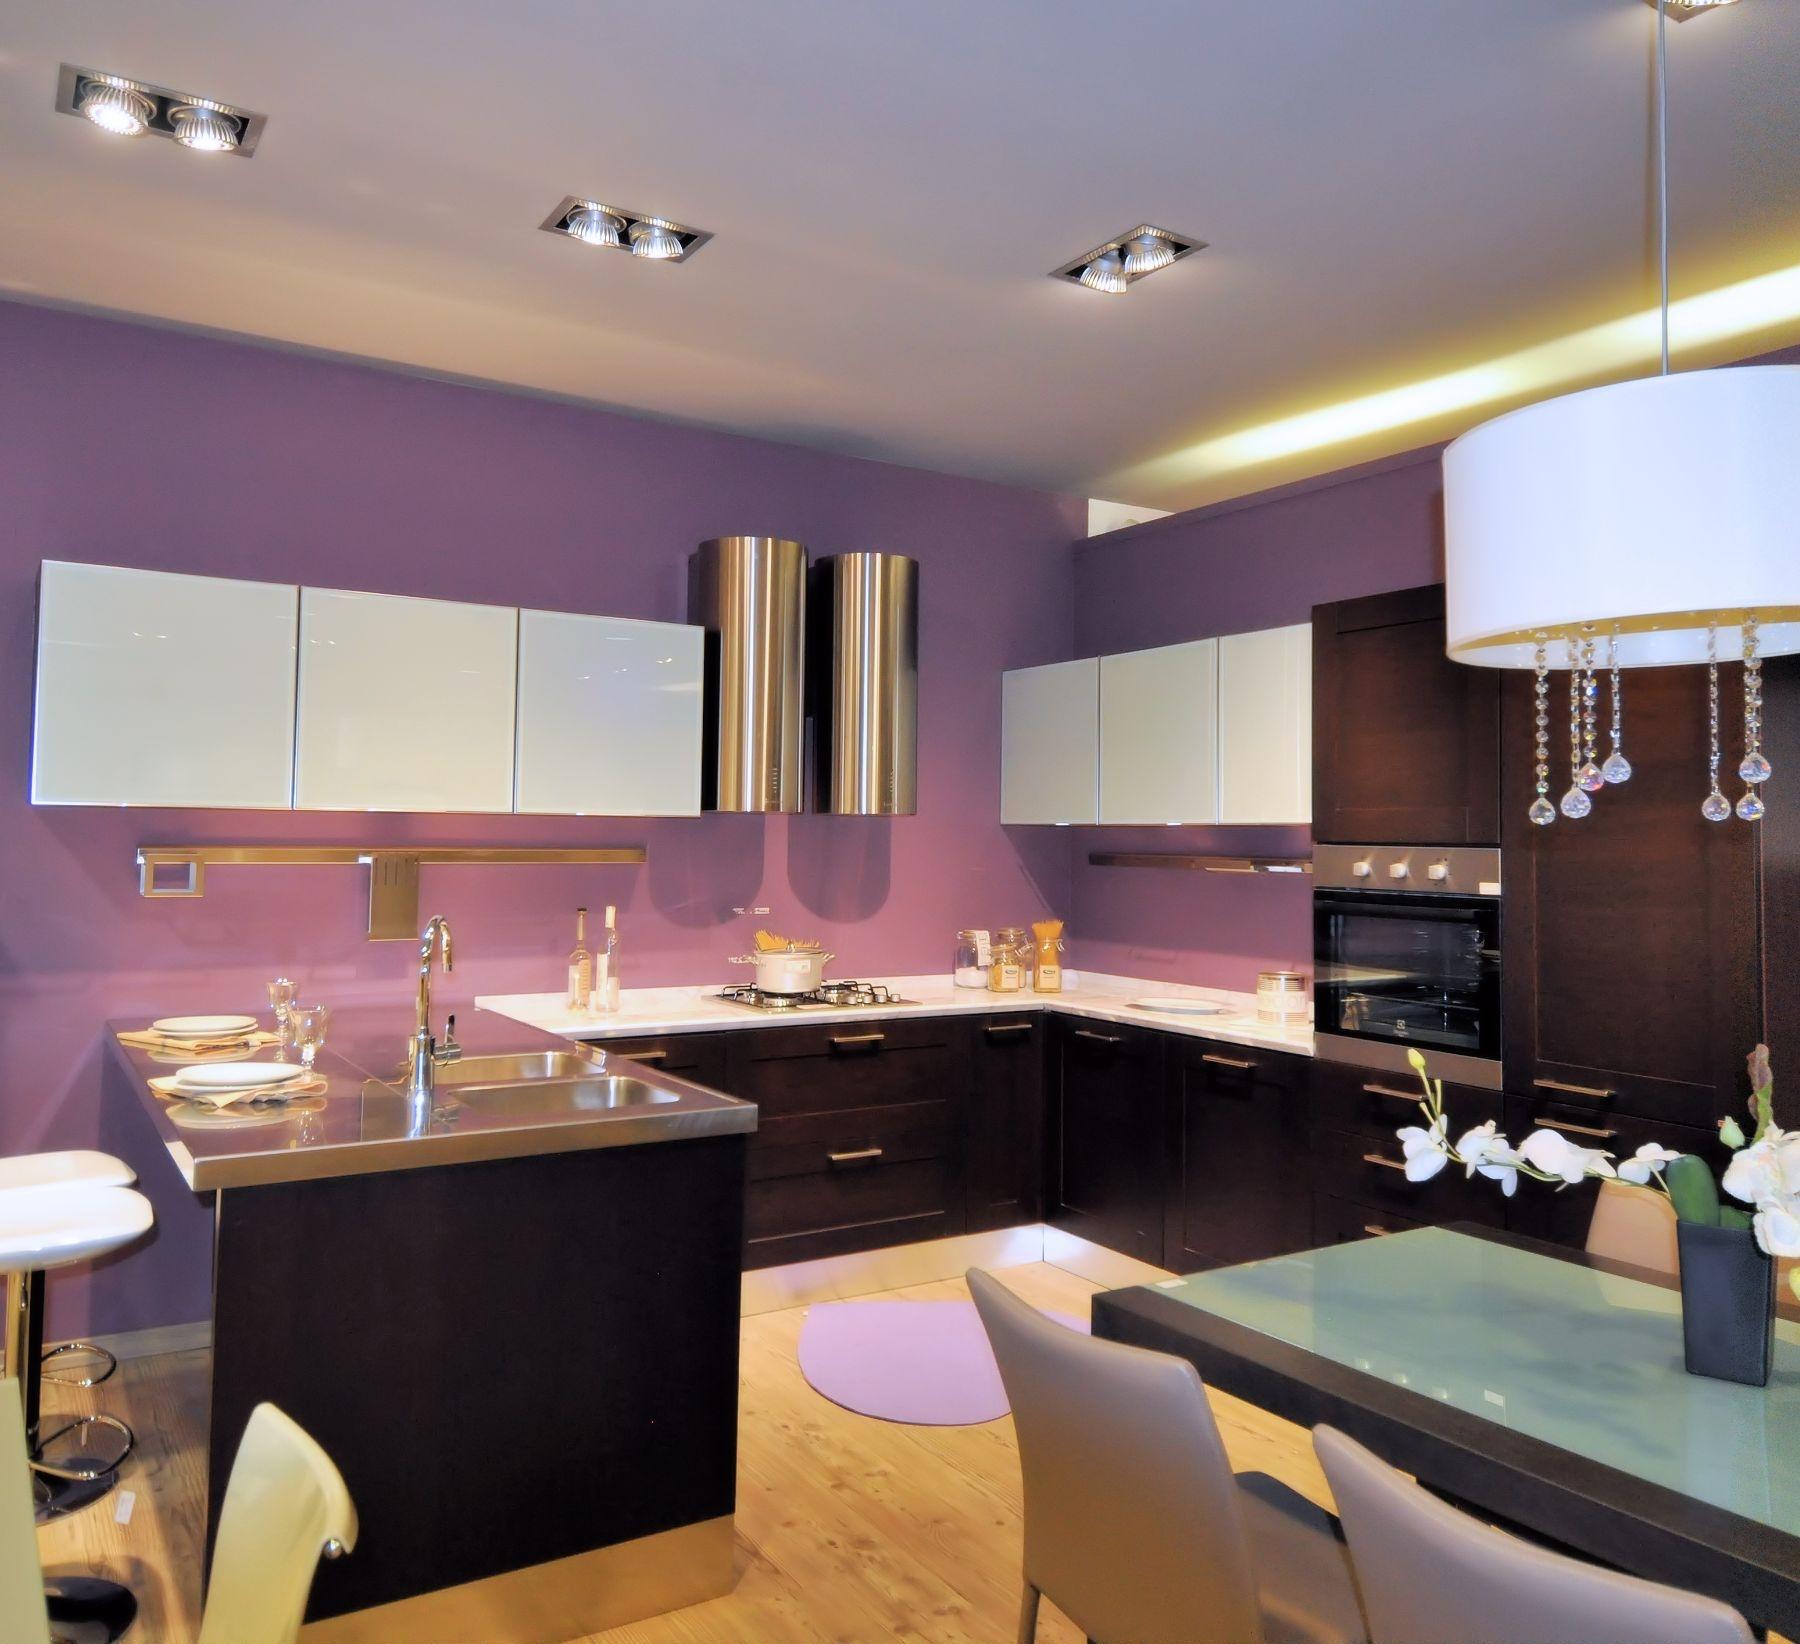 Cucine Scavolini Rainbow : Cucina scavolini rainbow scontato del cucine a